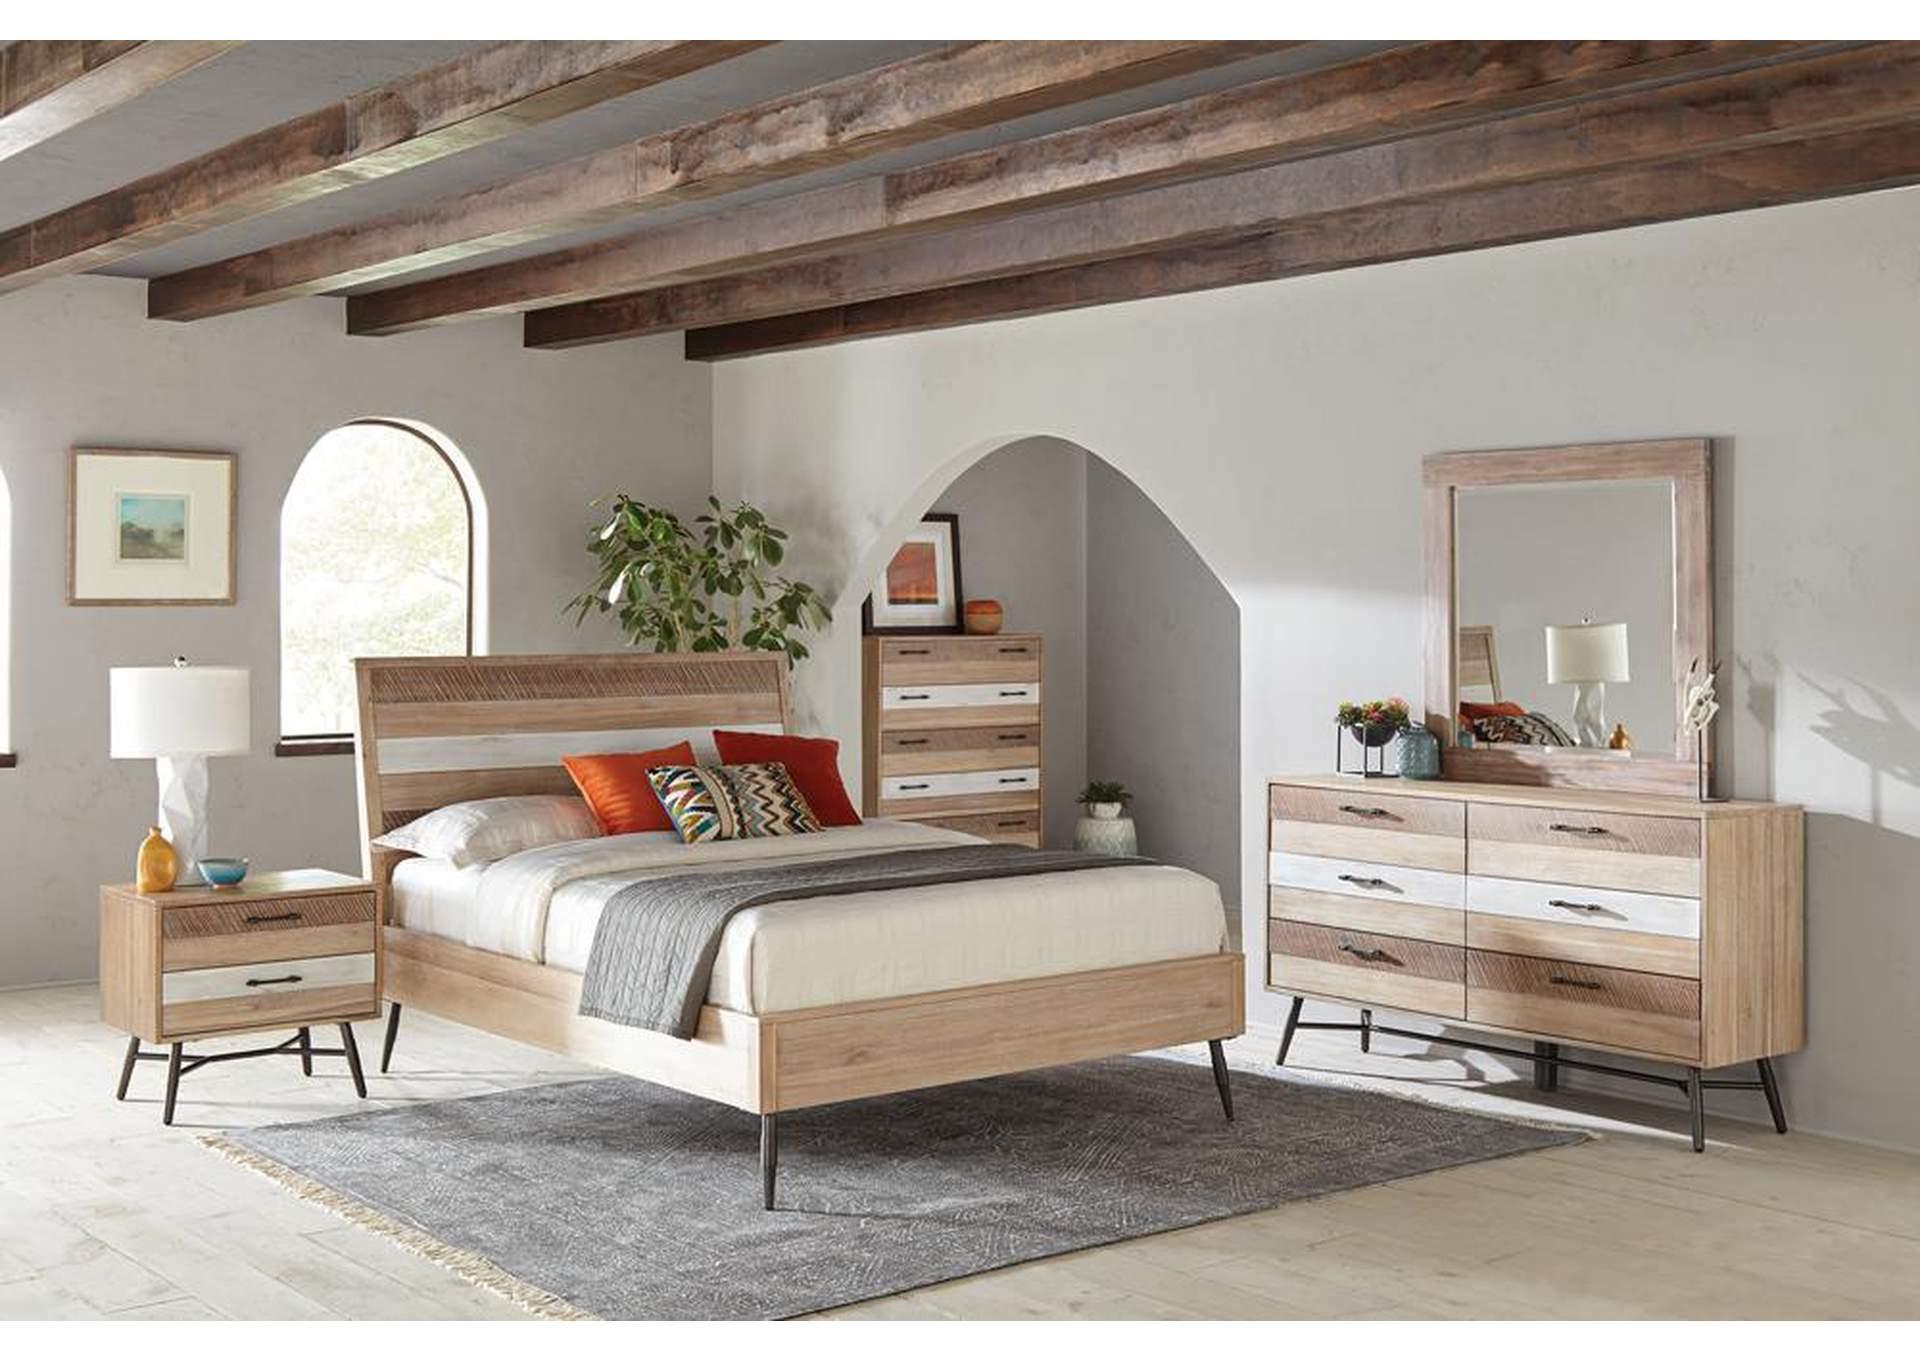 Tide 5 Piece California King Bedroom Set Best Buy Furniture And Mattress